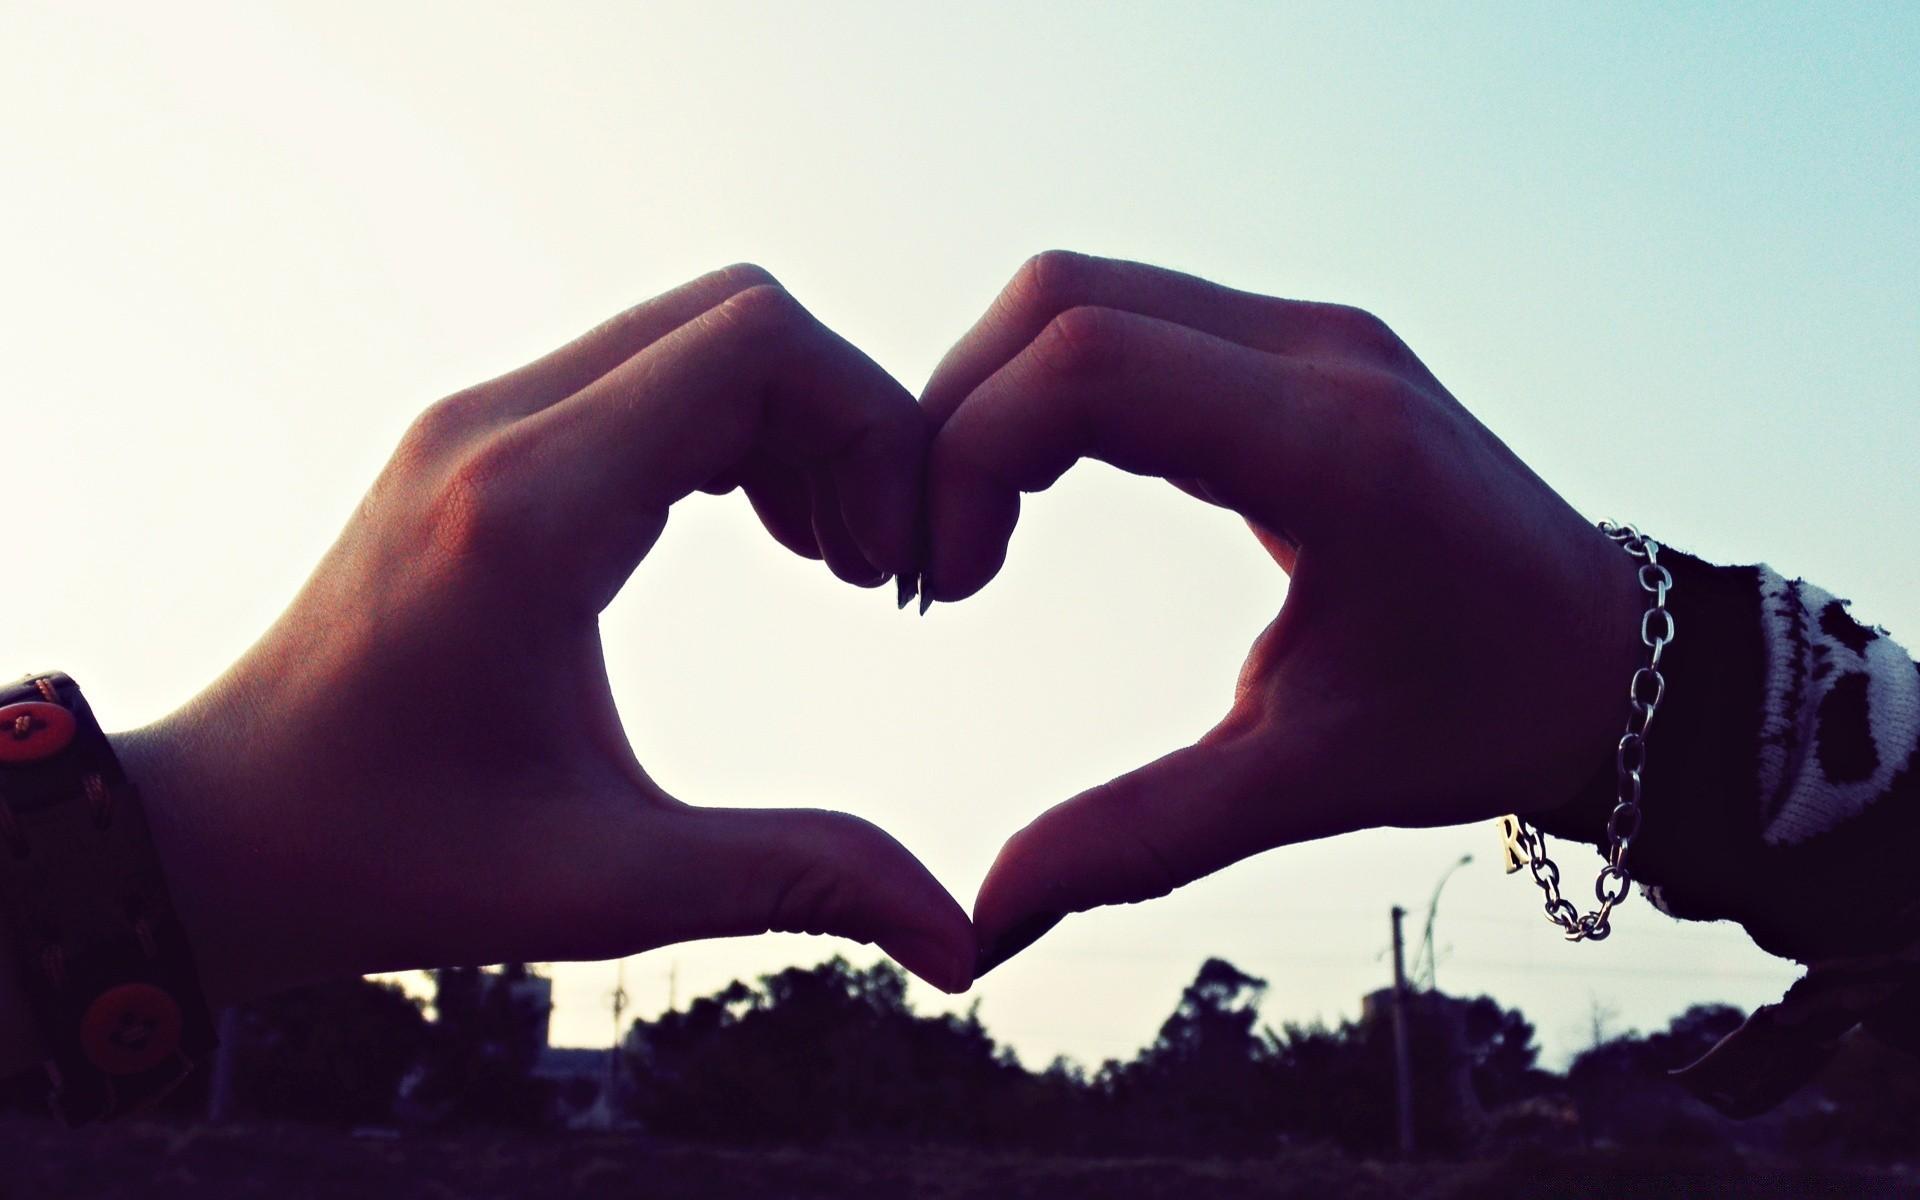 картинки про кохання на аву научитесь создавать